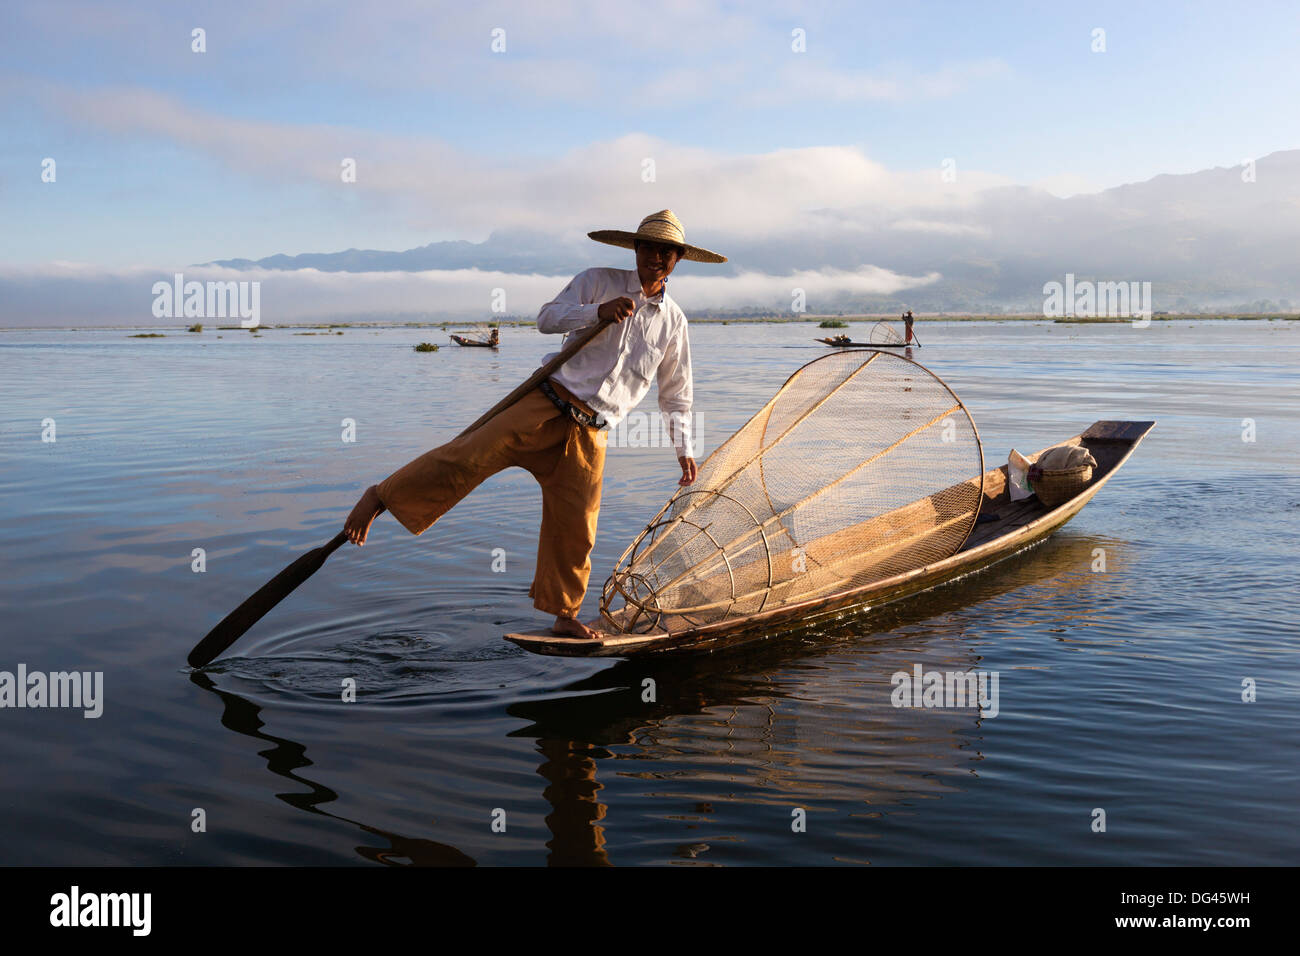 Gamba Intha-rower pescatore, Lago Inle, Stato Shan, Myanmar (Birmania), Asia Immagini Stock